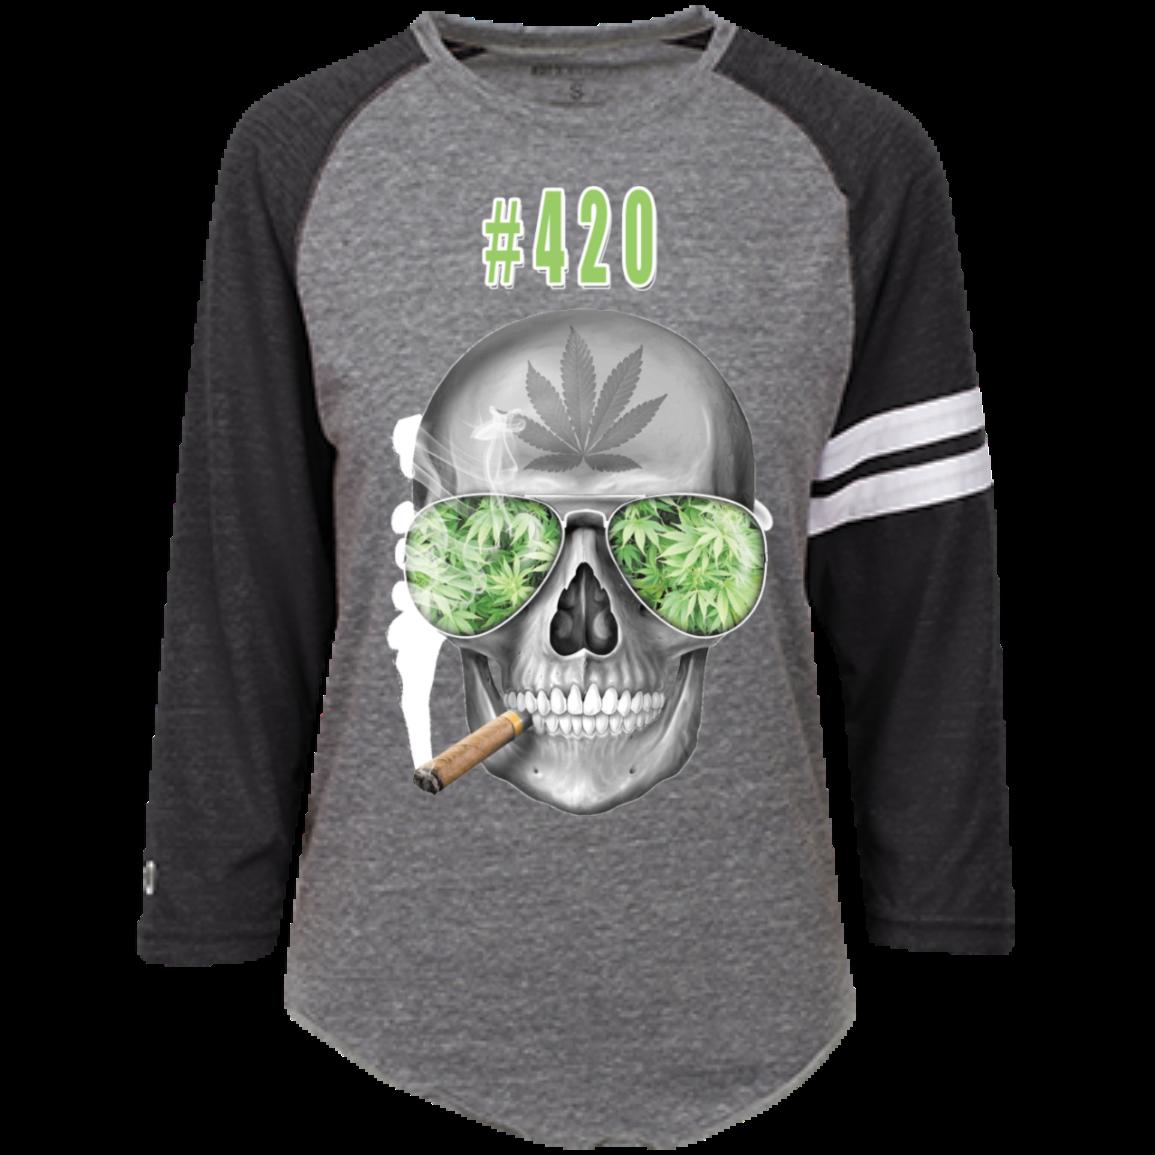 #420 Weed Heathered Vintage Shirt 1